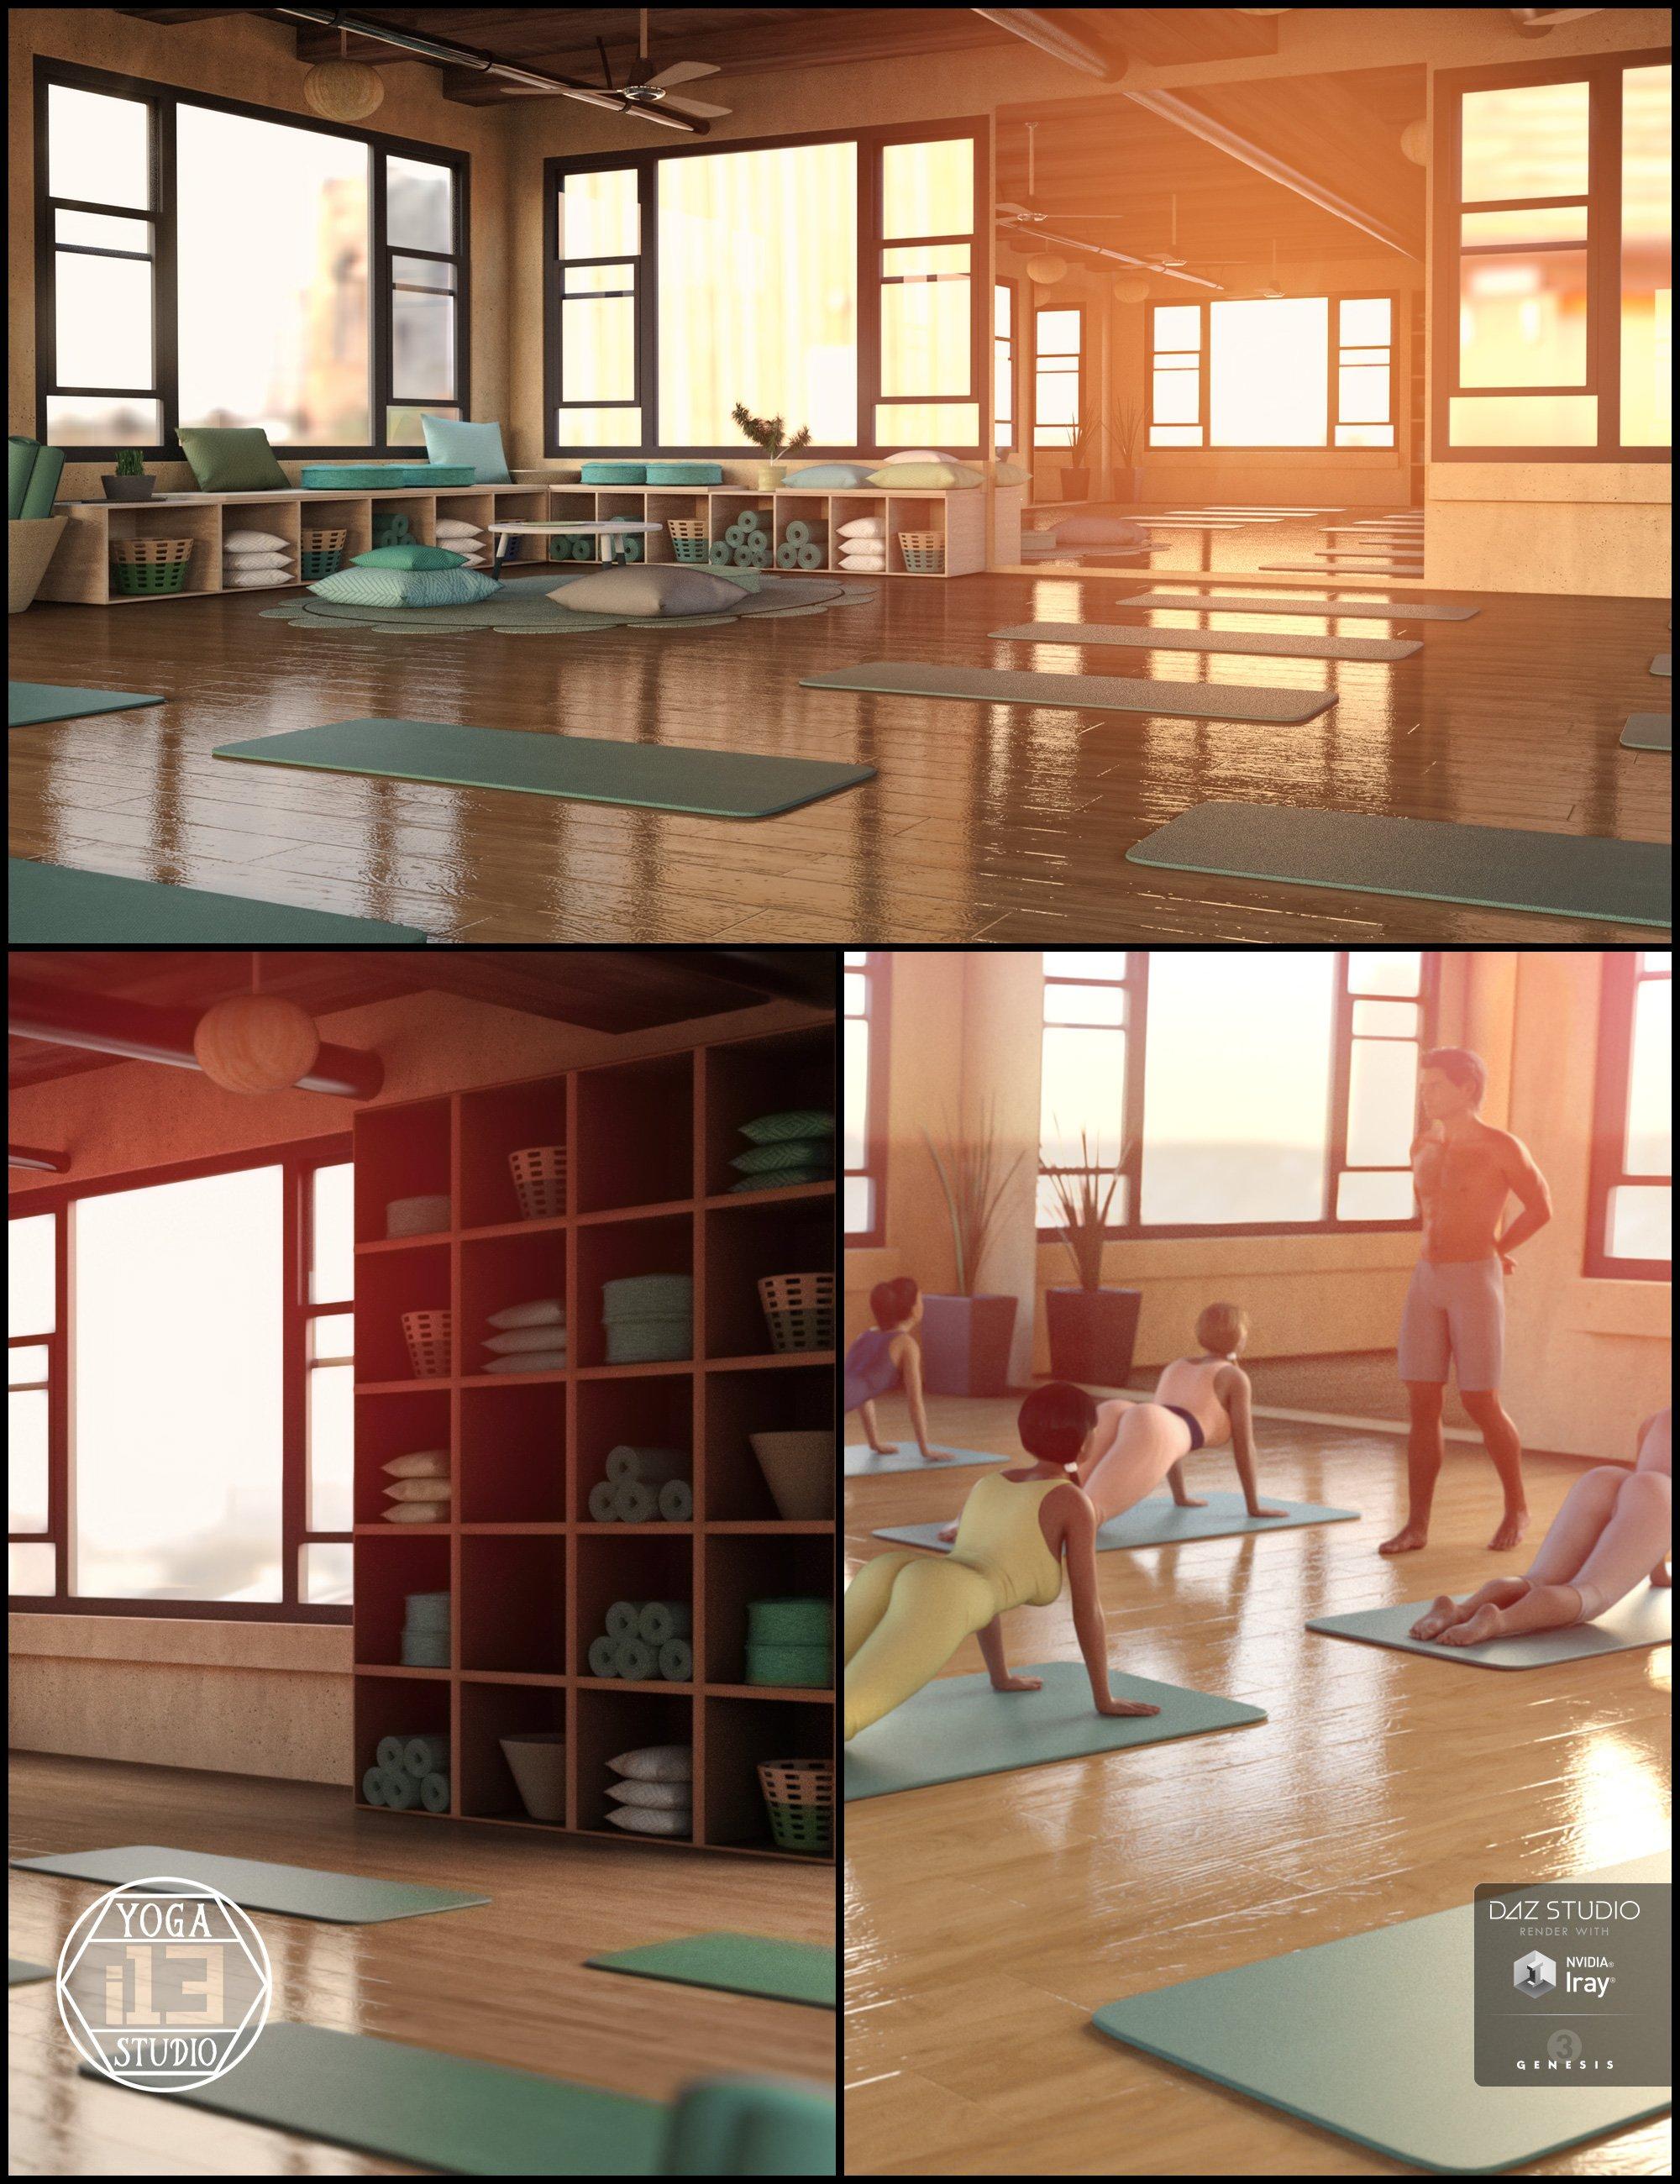 i13 Yoga Studio Environment by: ironman13, 3D Models by Daz 3D